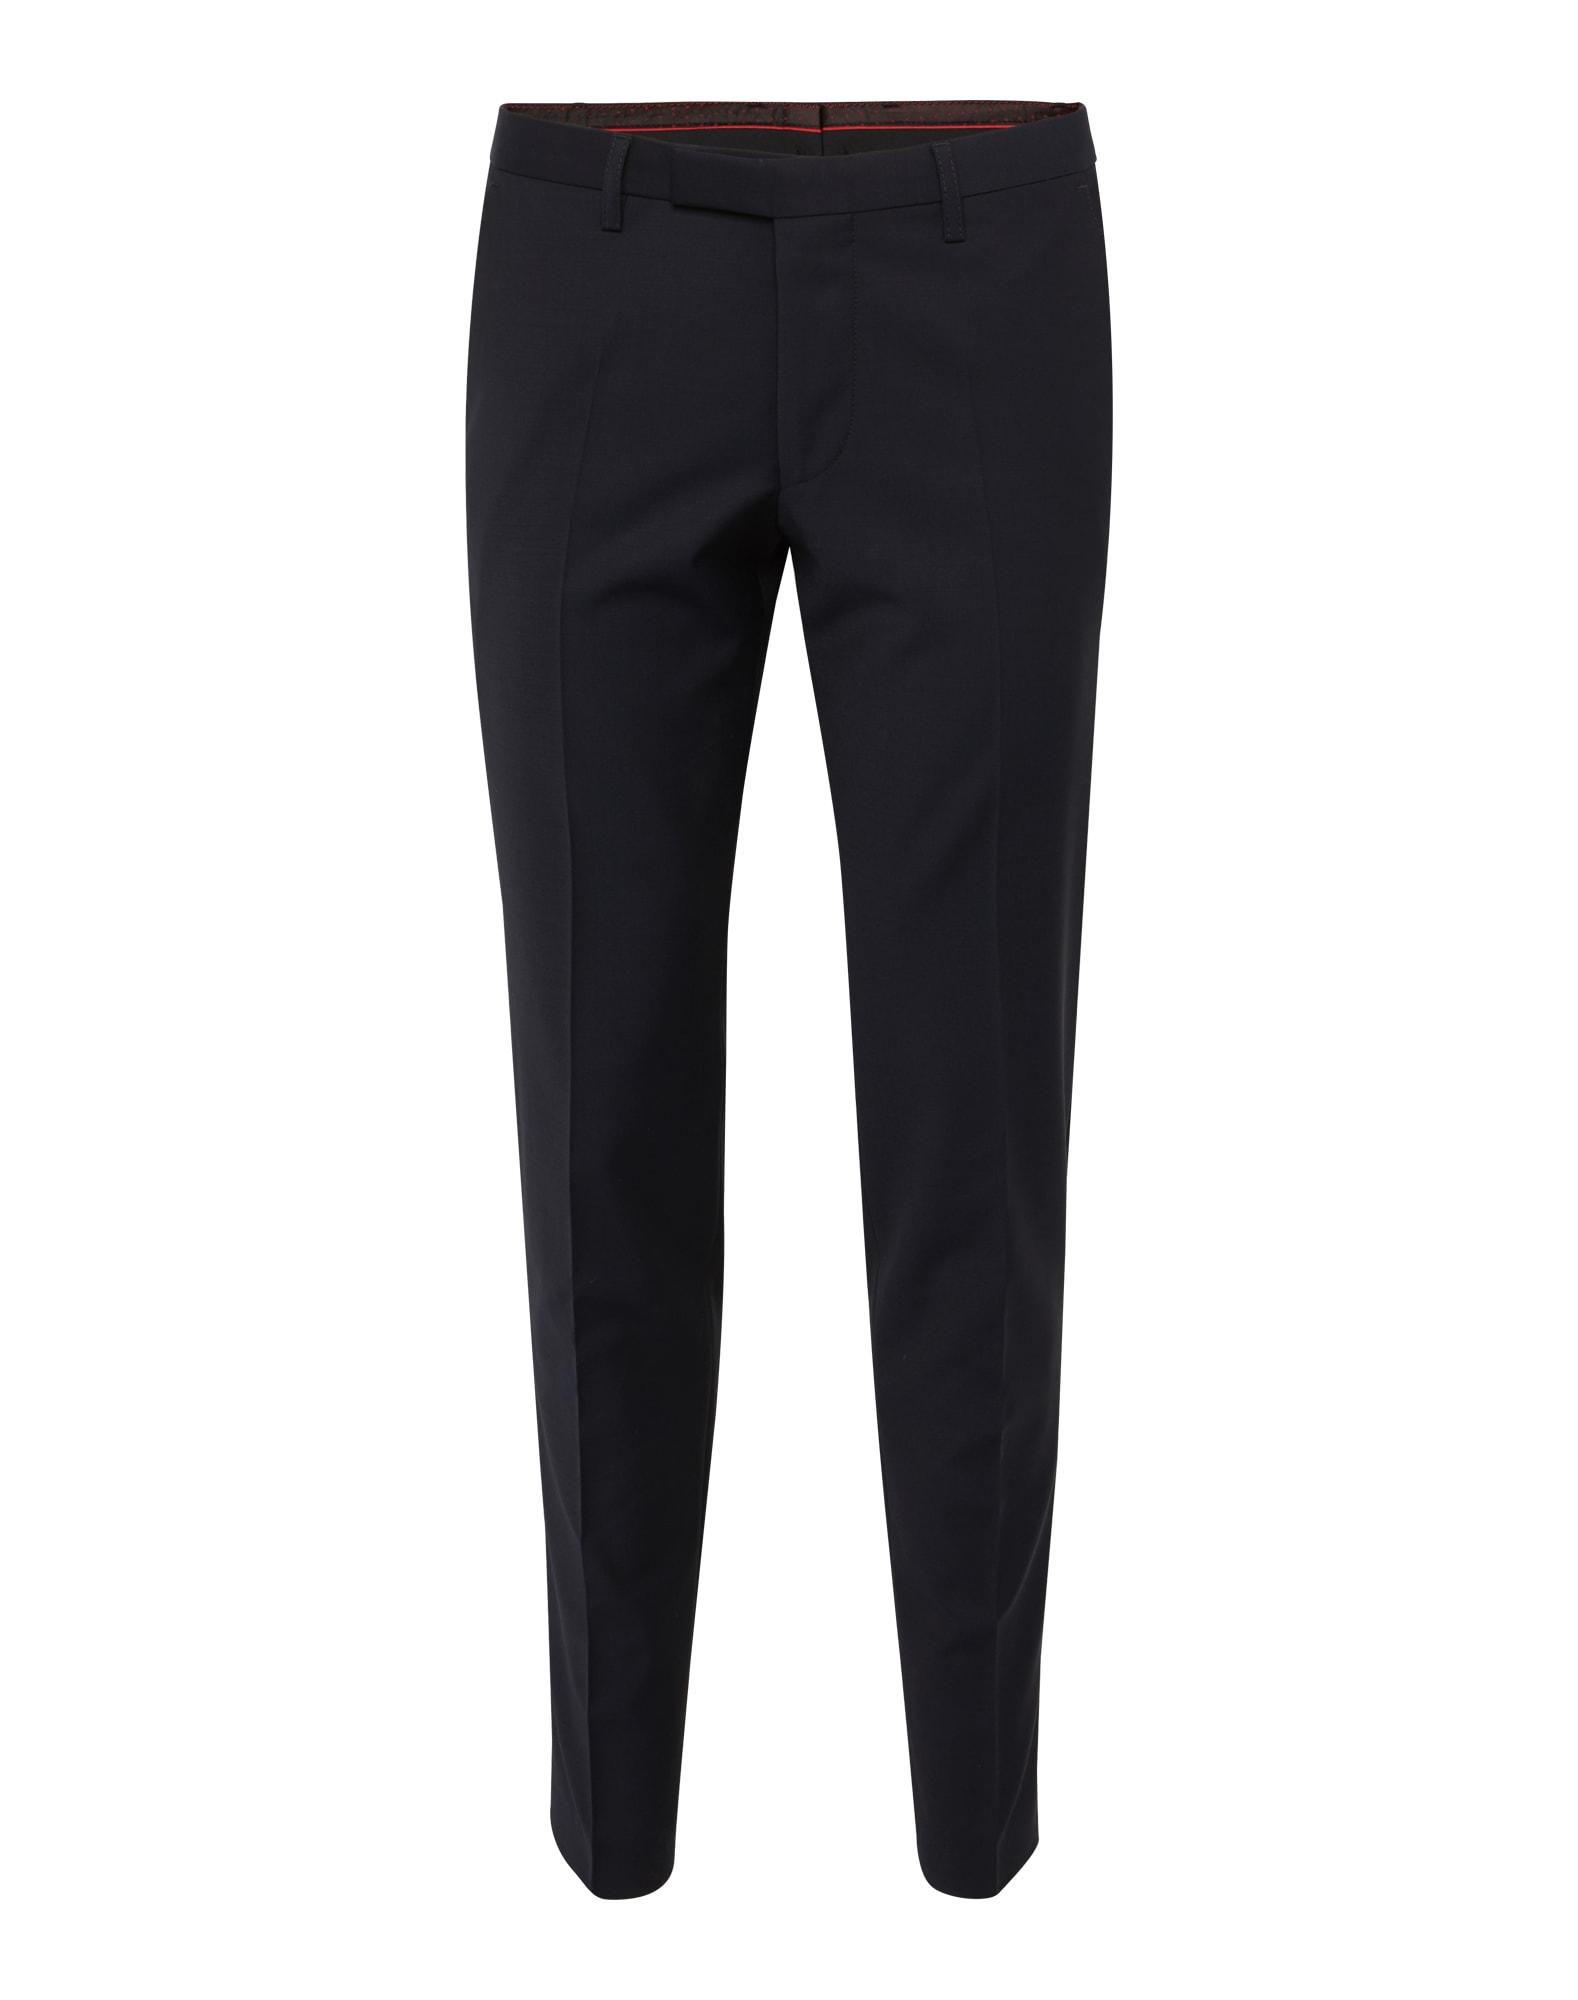 Kalhoty s puky Cipanetti tmavě modrá CINQUE